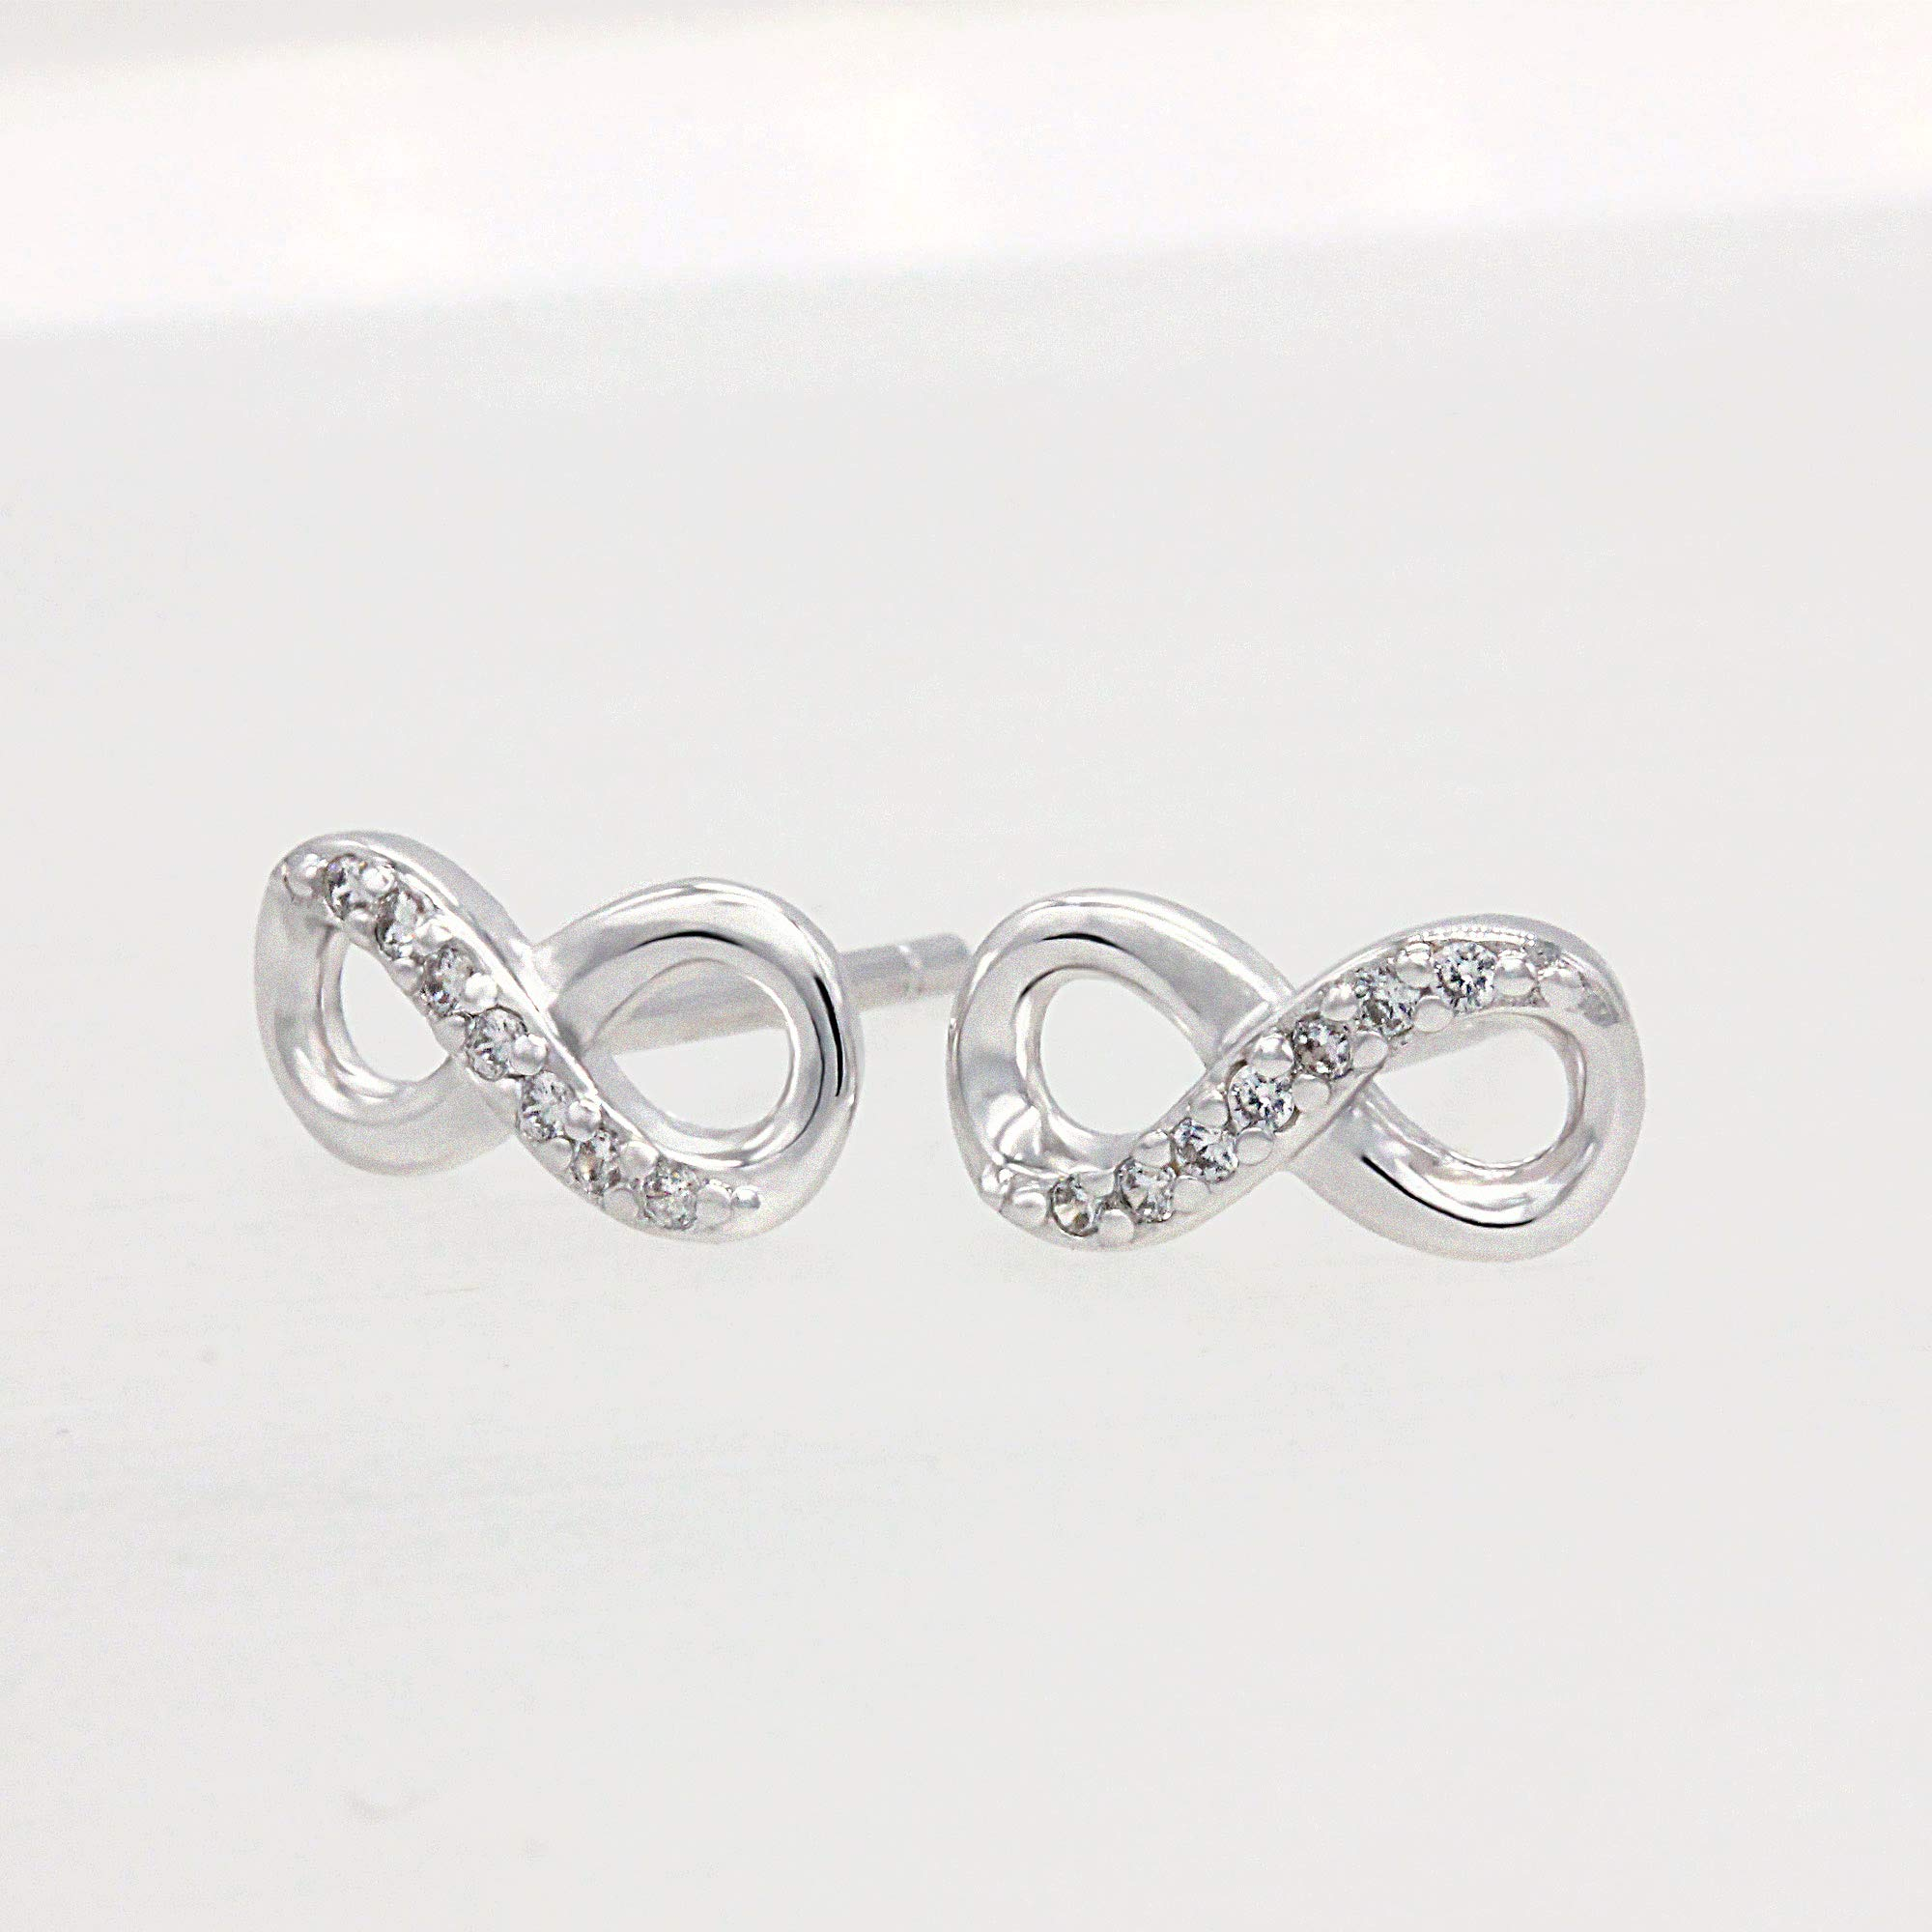 Spoil Cupid Rhodium Plated Sterling Silver Cubic Zirconia Half Set Infinity Stud Earrings